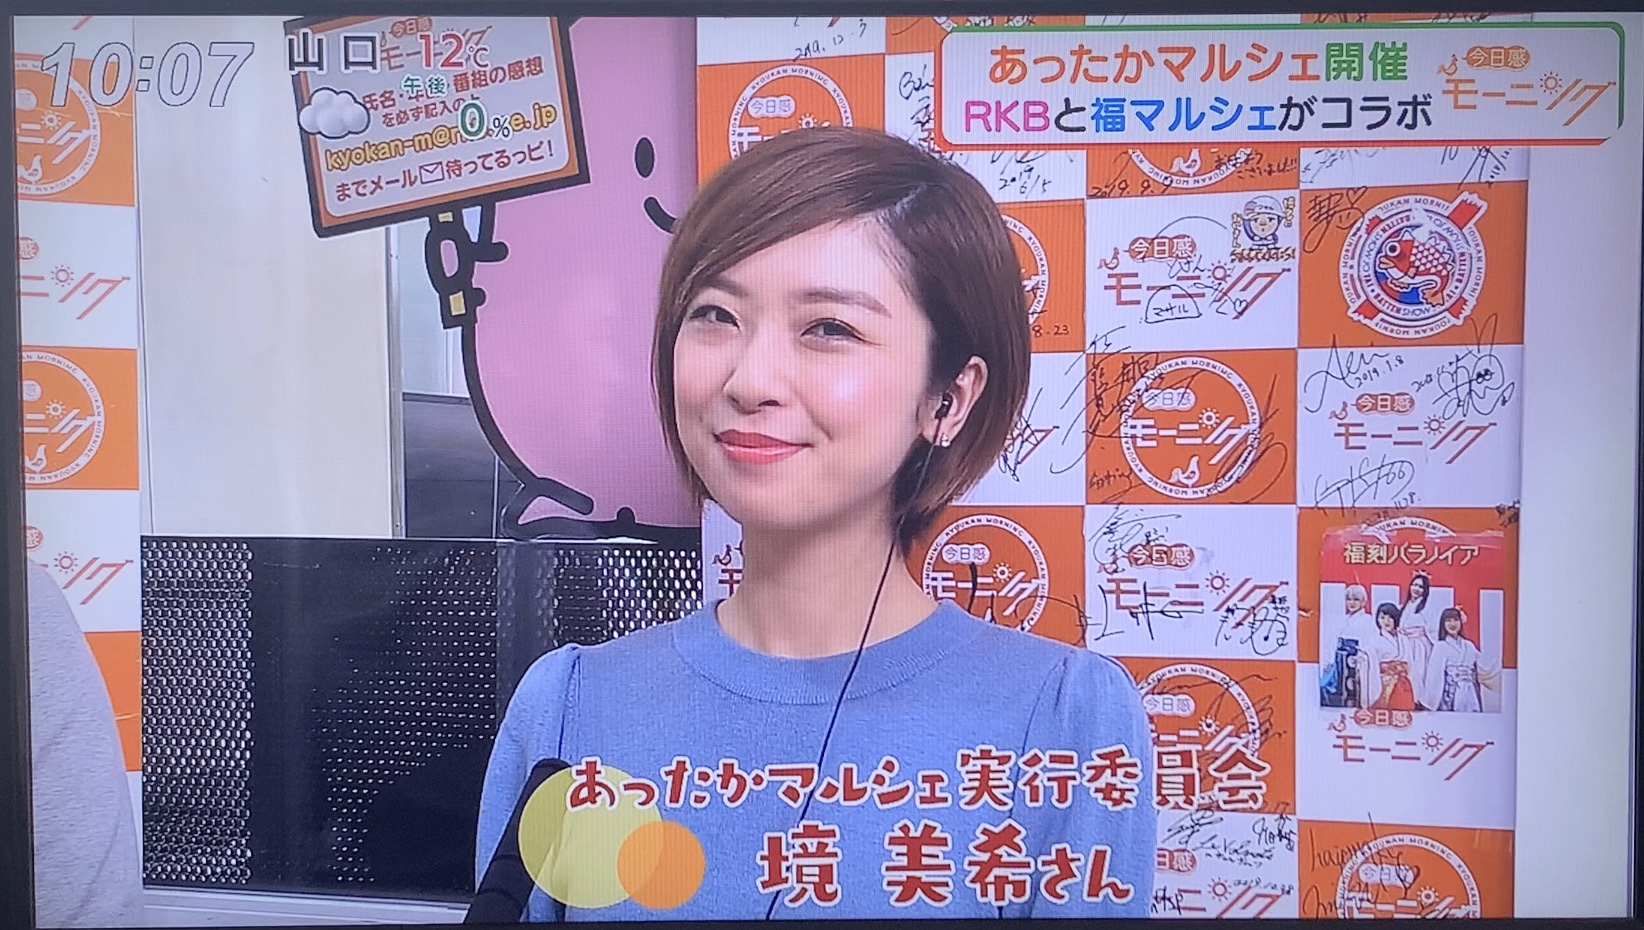 【TV】RKB放送さんの「今日感モーニング」に生出演しました!